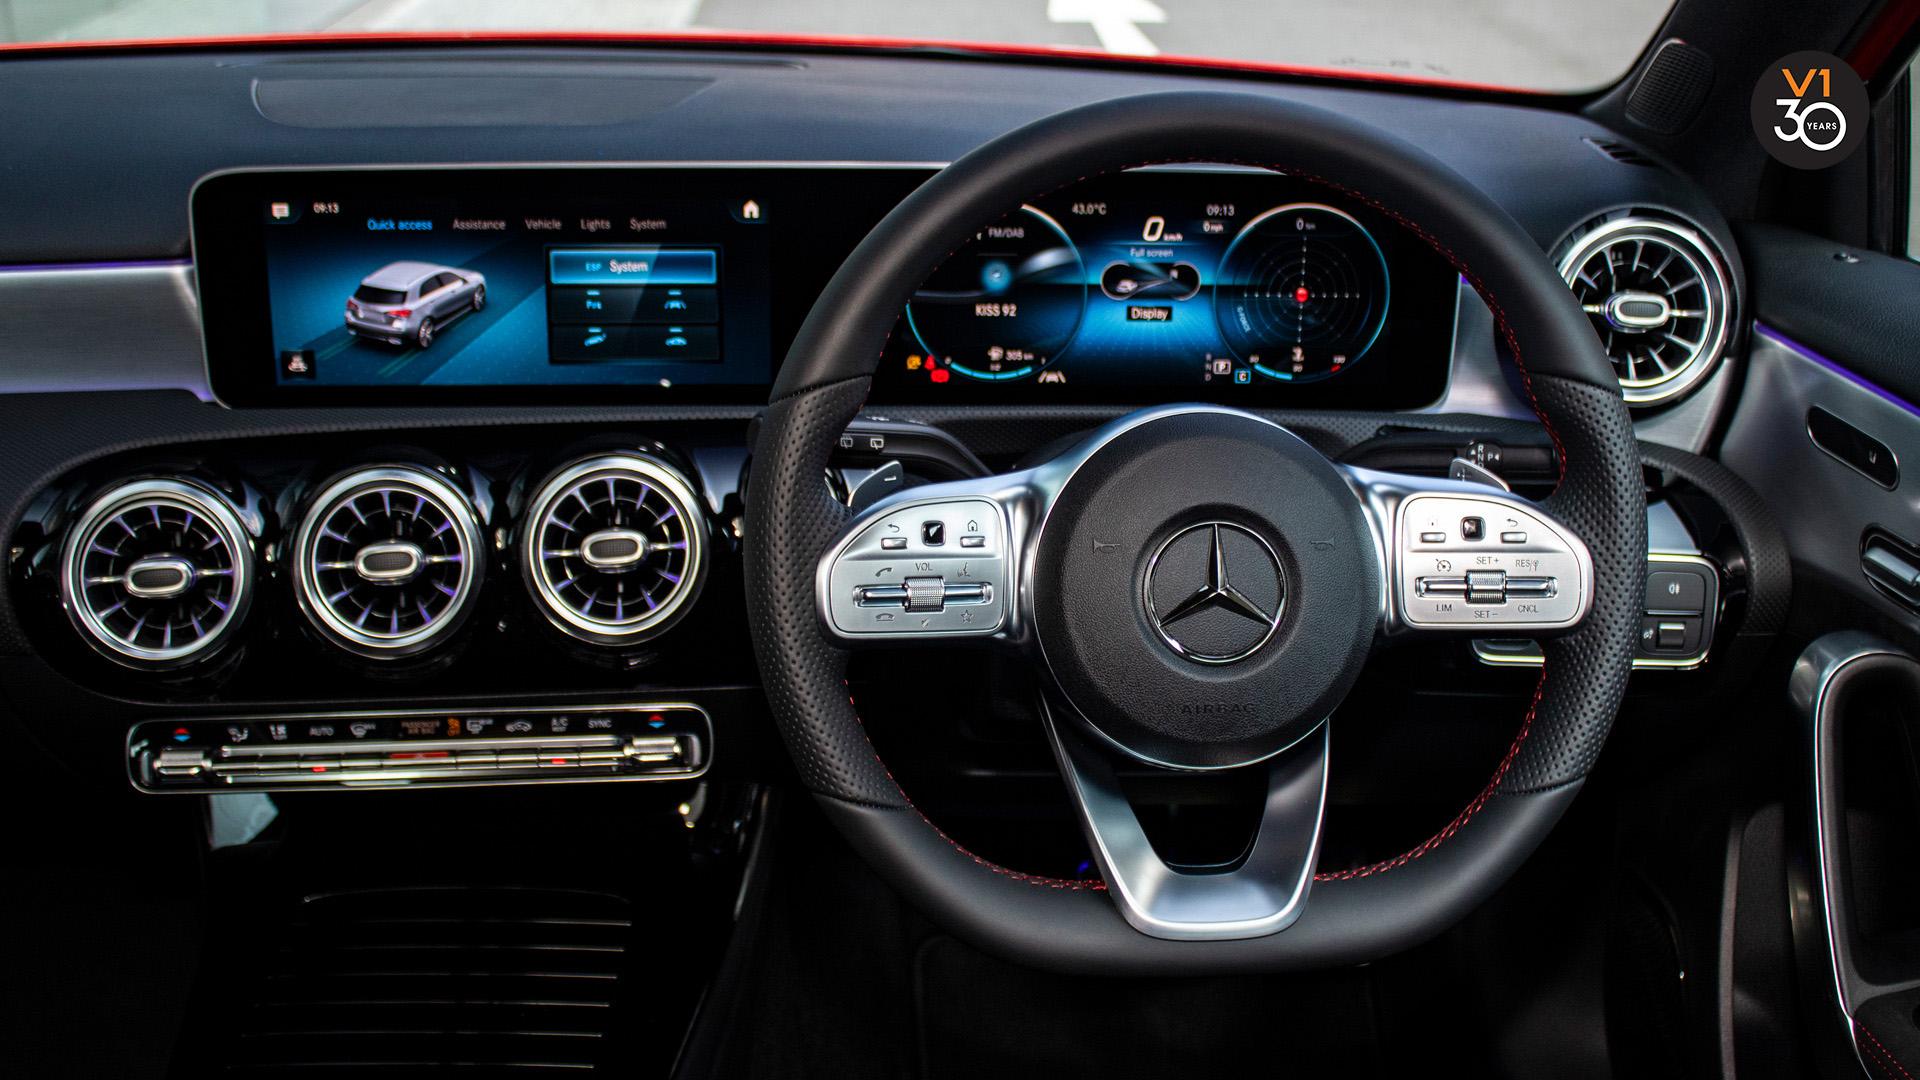 Mercedes-Benz A200 AMG Premium Plus - Steering Wheel